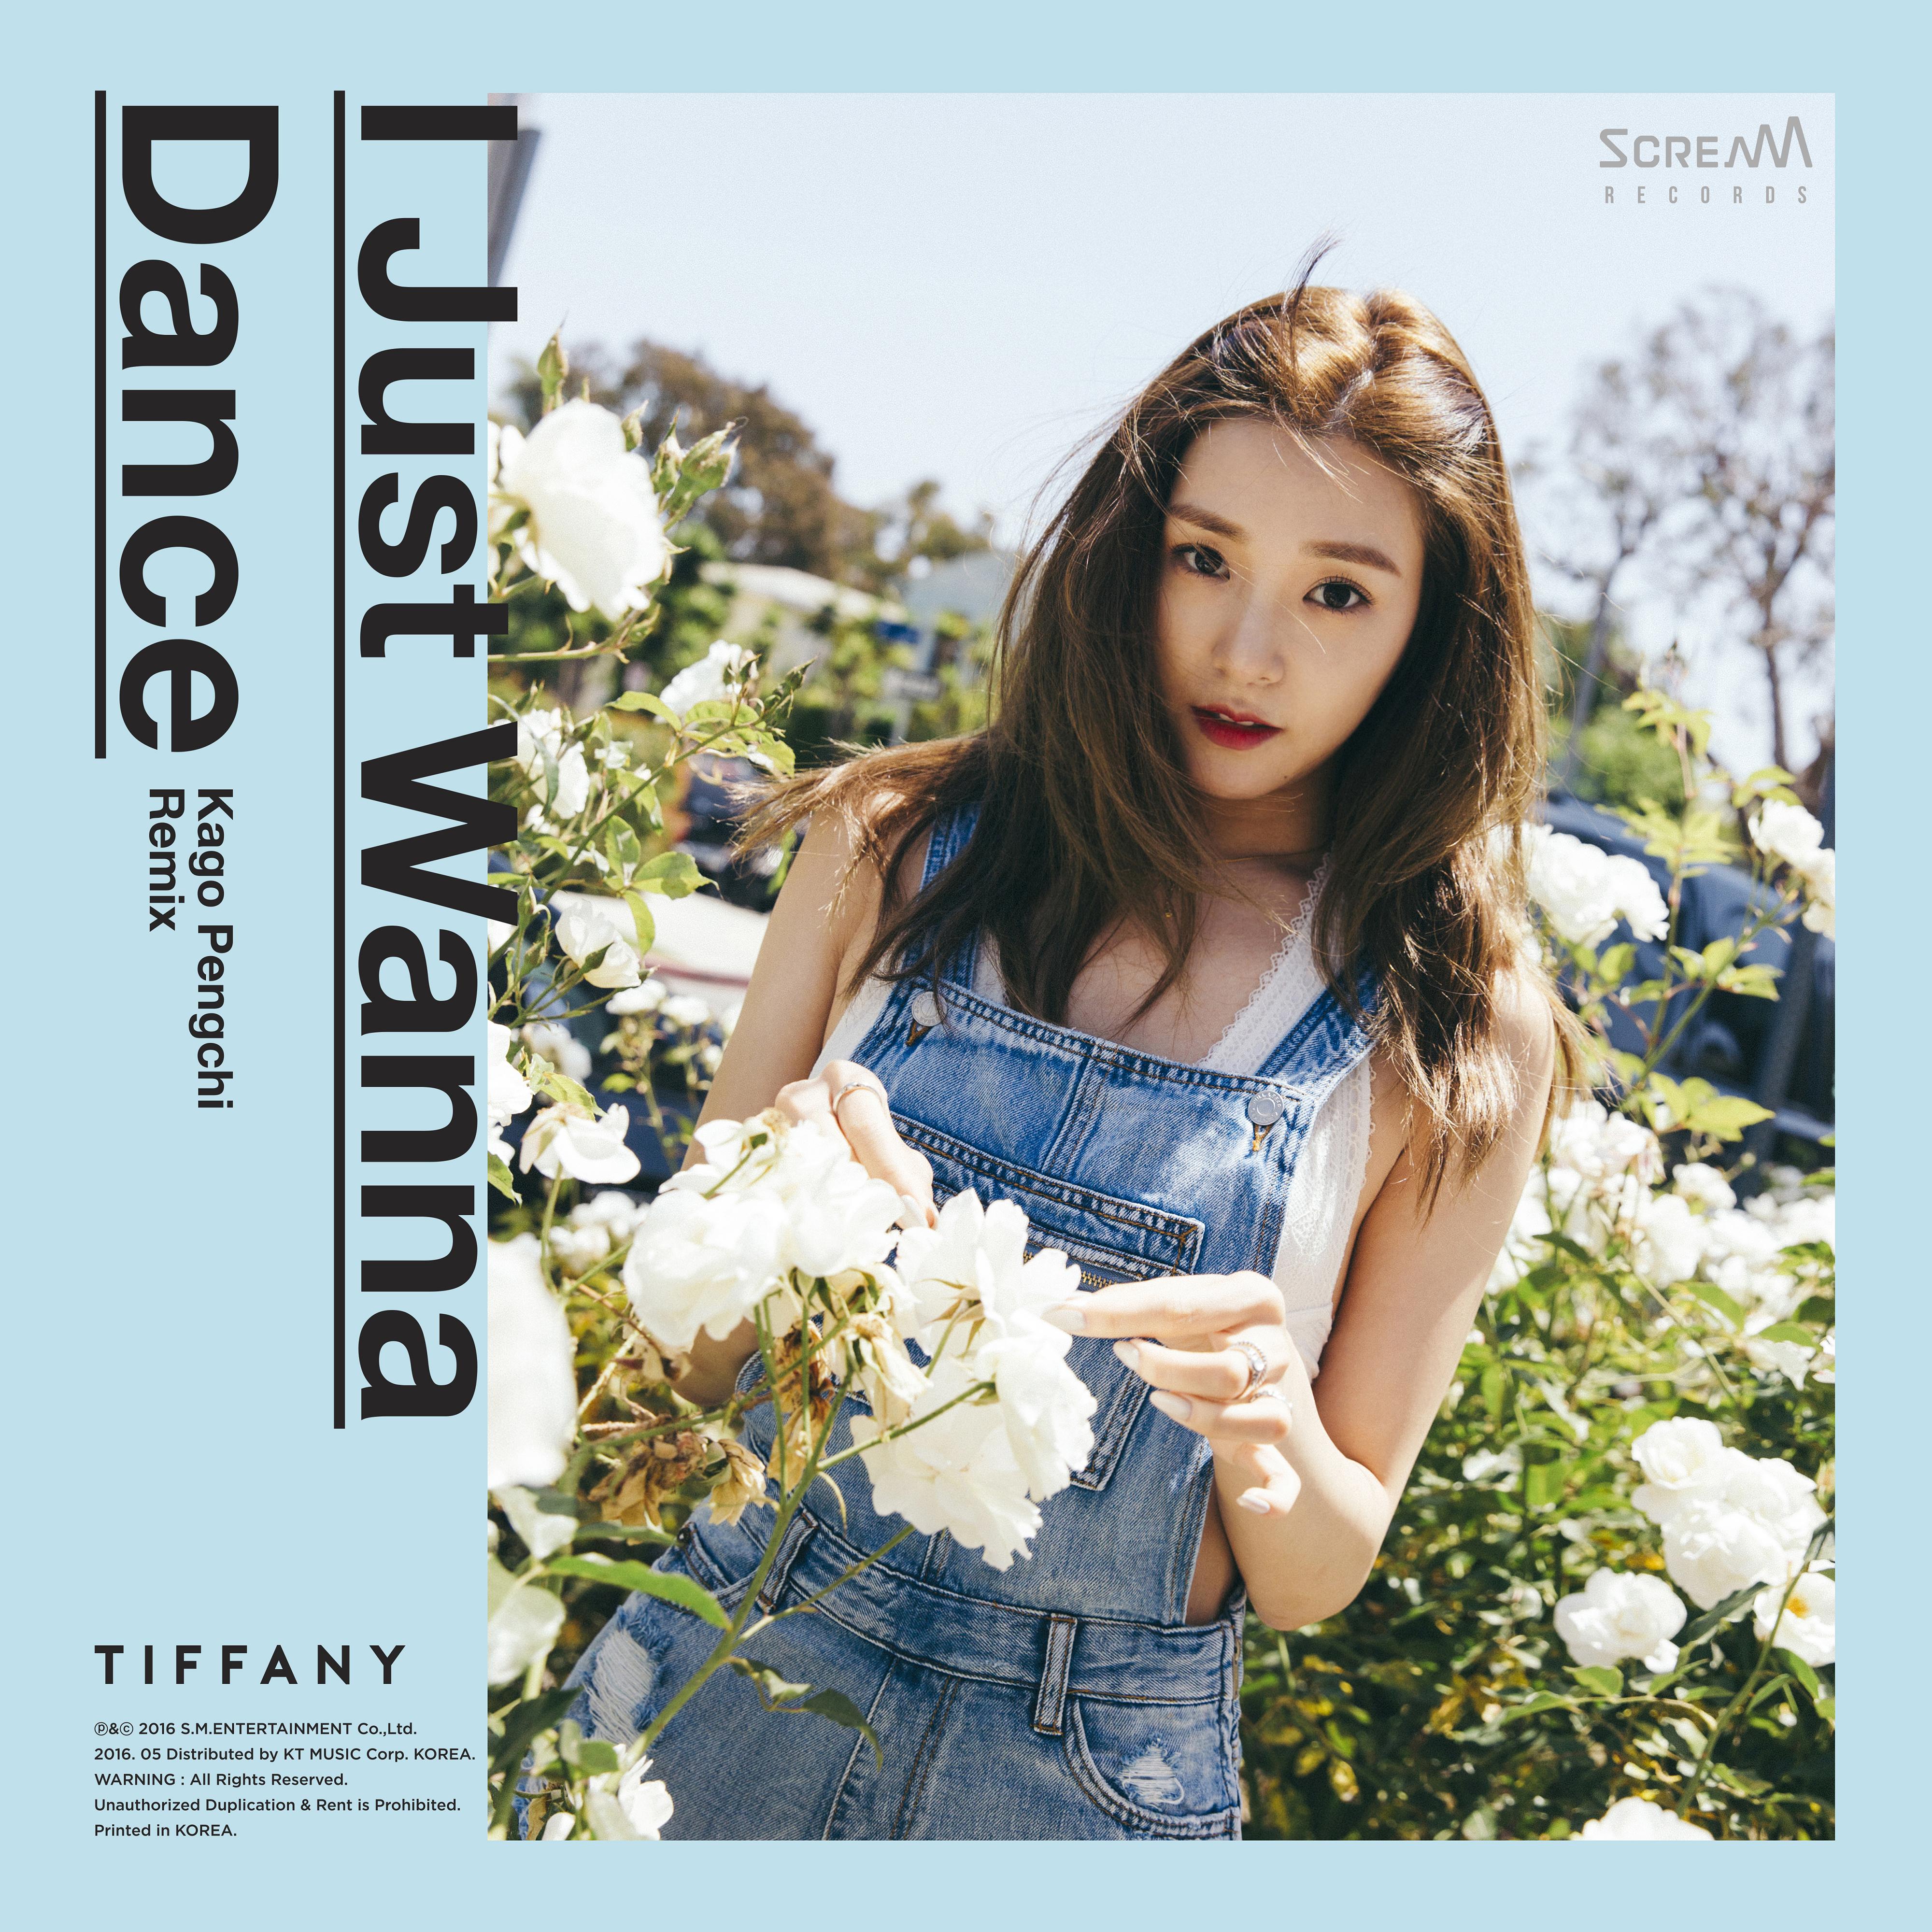 20170921.1618.29 Tiffany (Girls' Generation) - I Just Wanna Dance (Kago Pengchi remix) cover.jpg